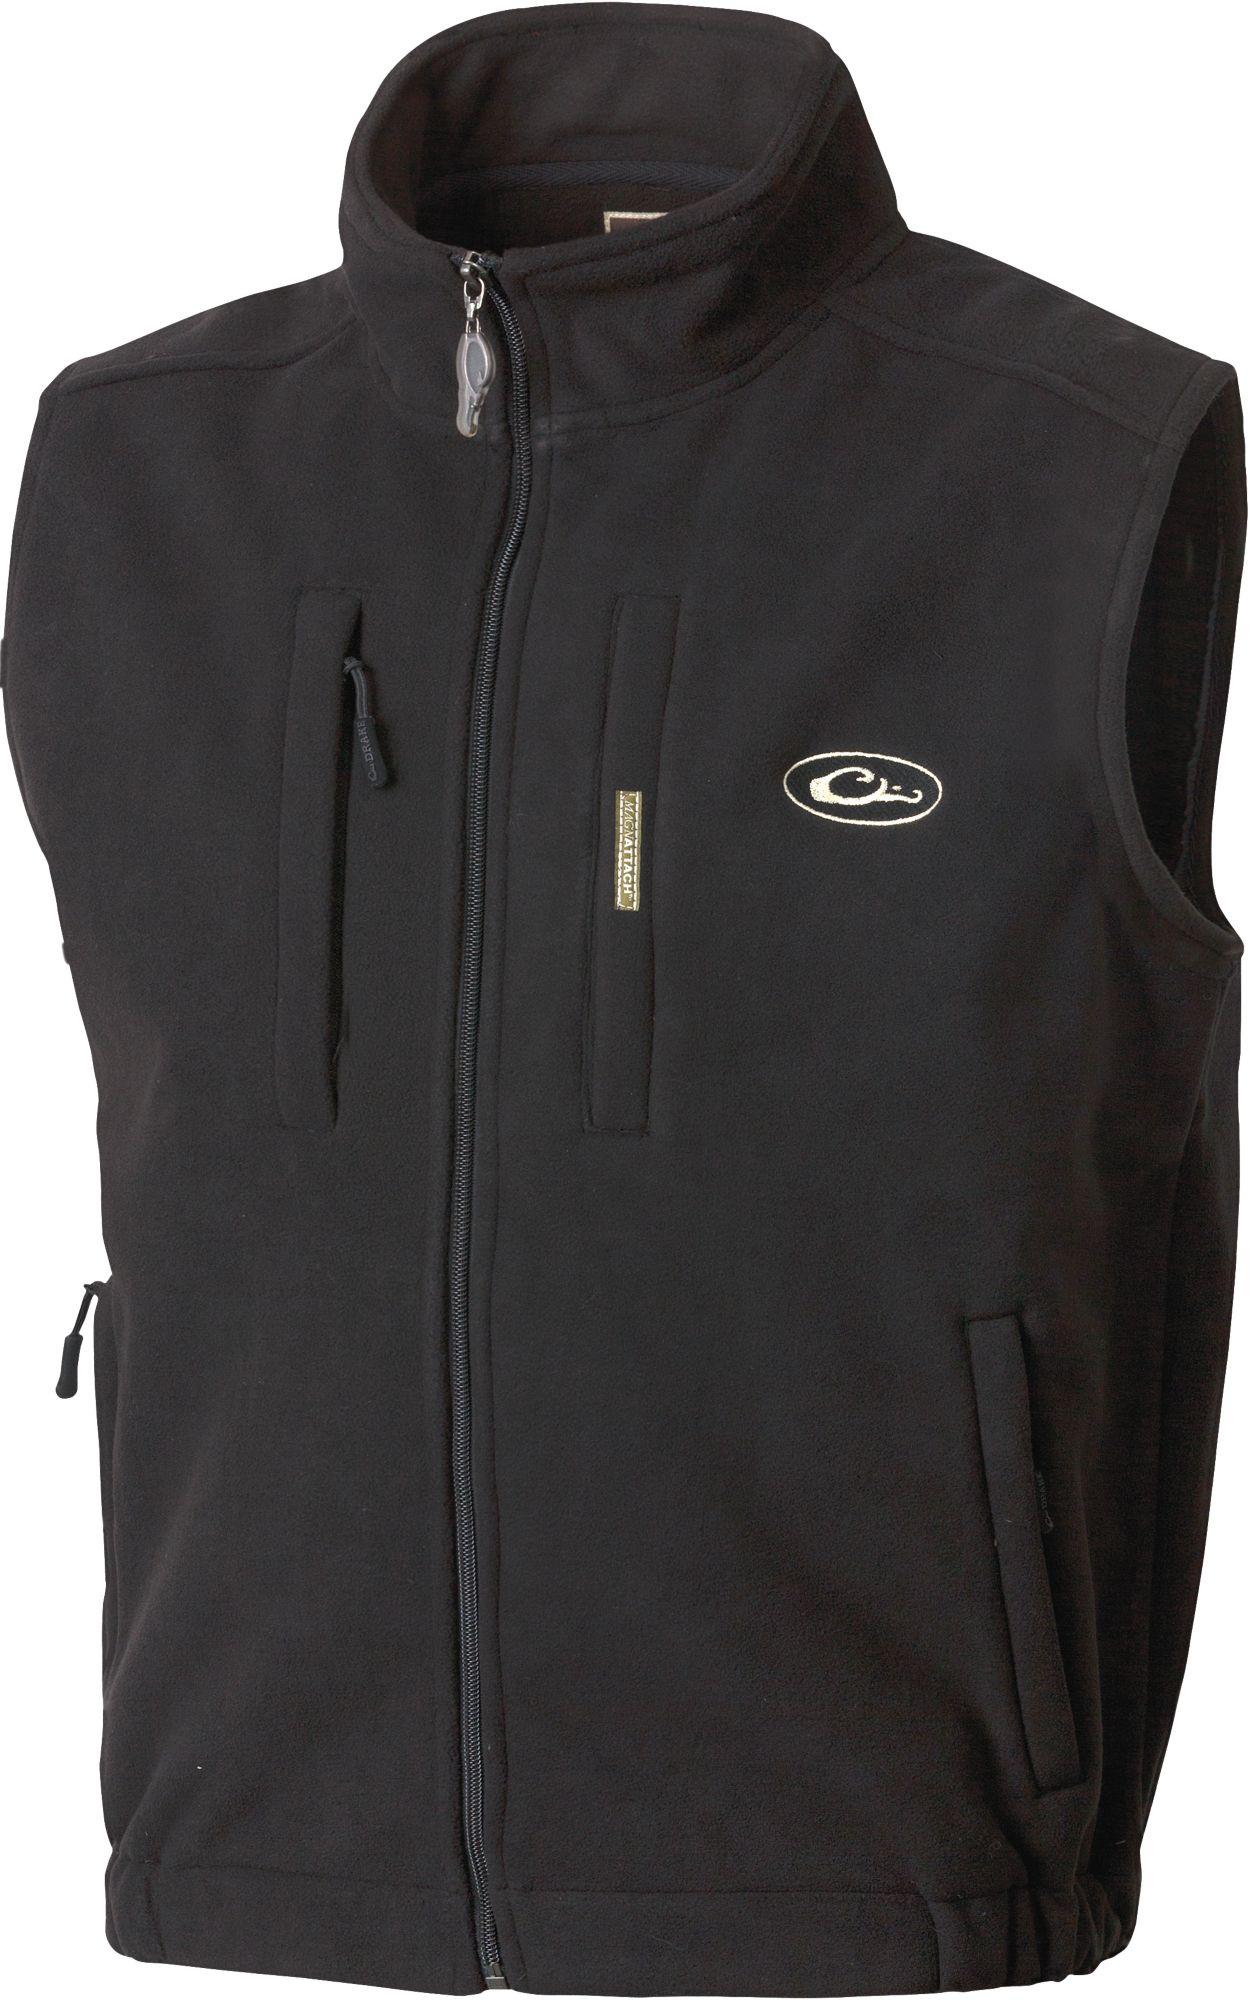 Drake Waterfowl Men's MST Windproof Layering Vest, Size: XXL, Black thumbnail